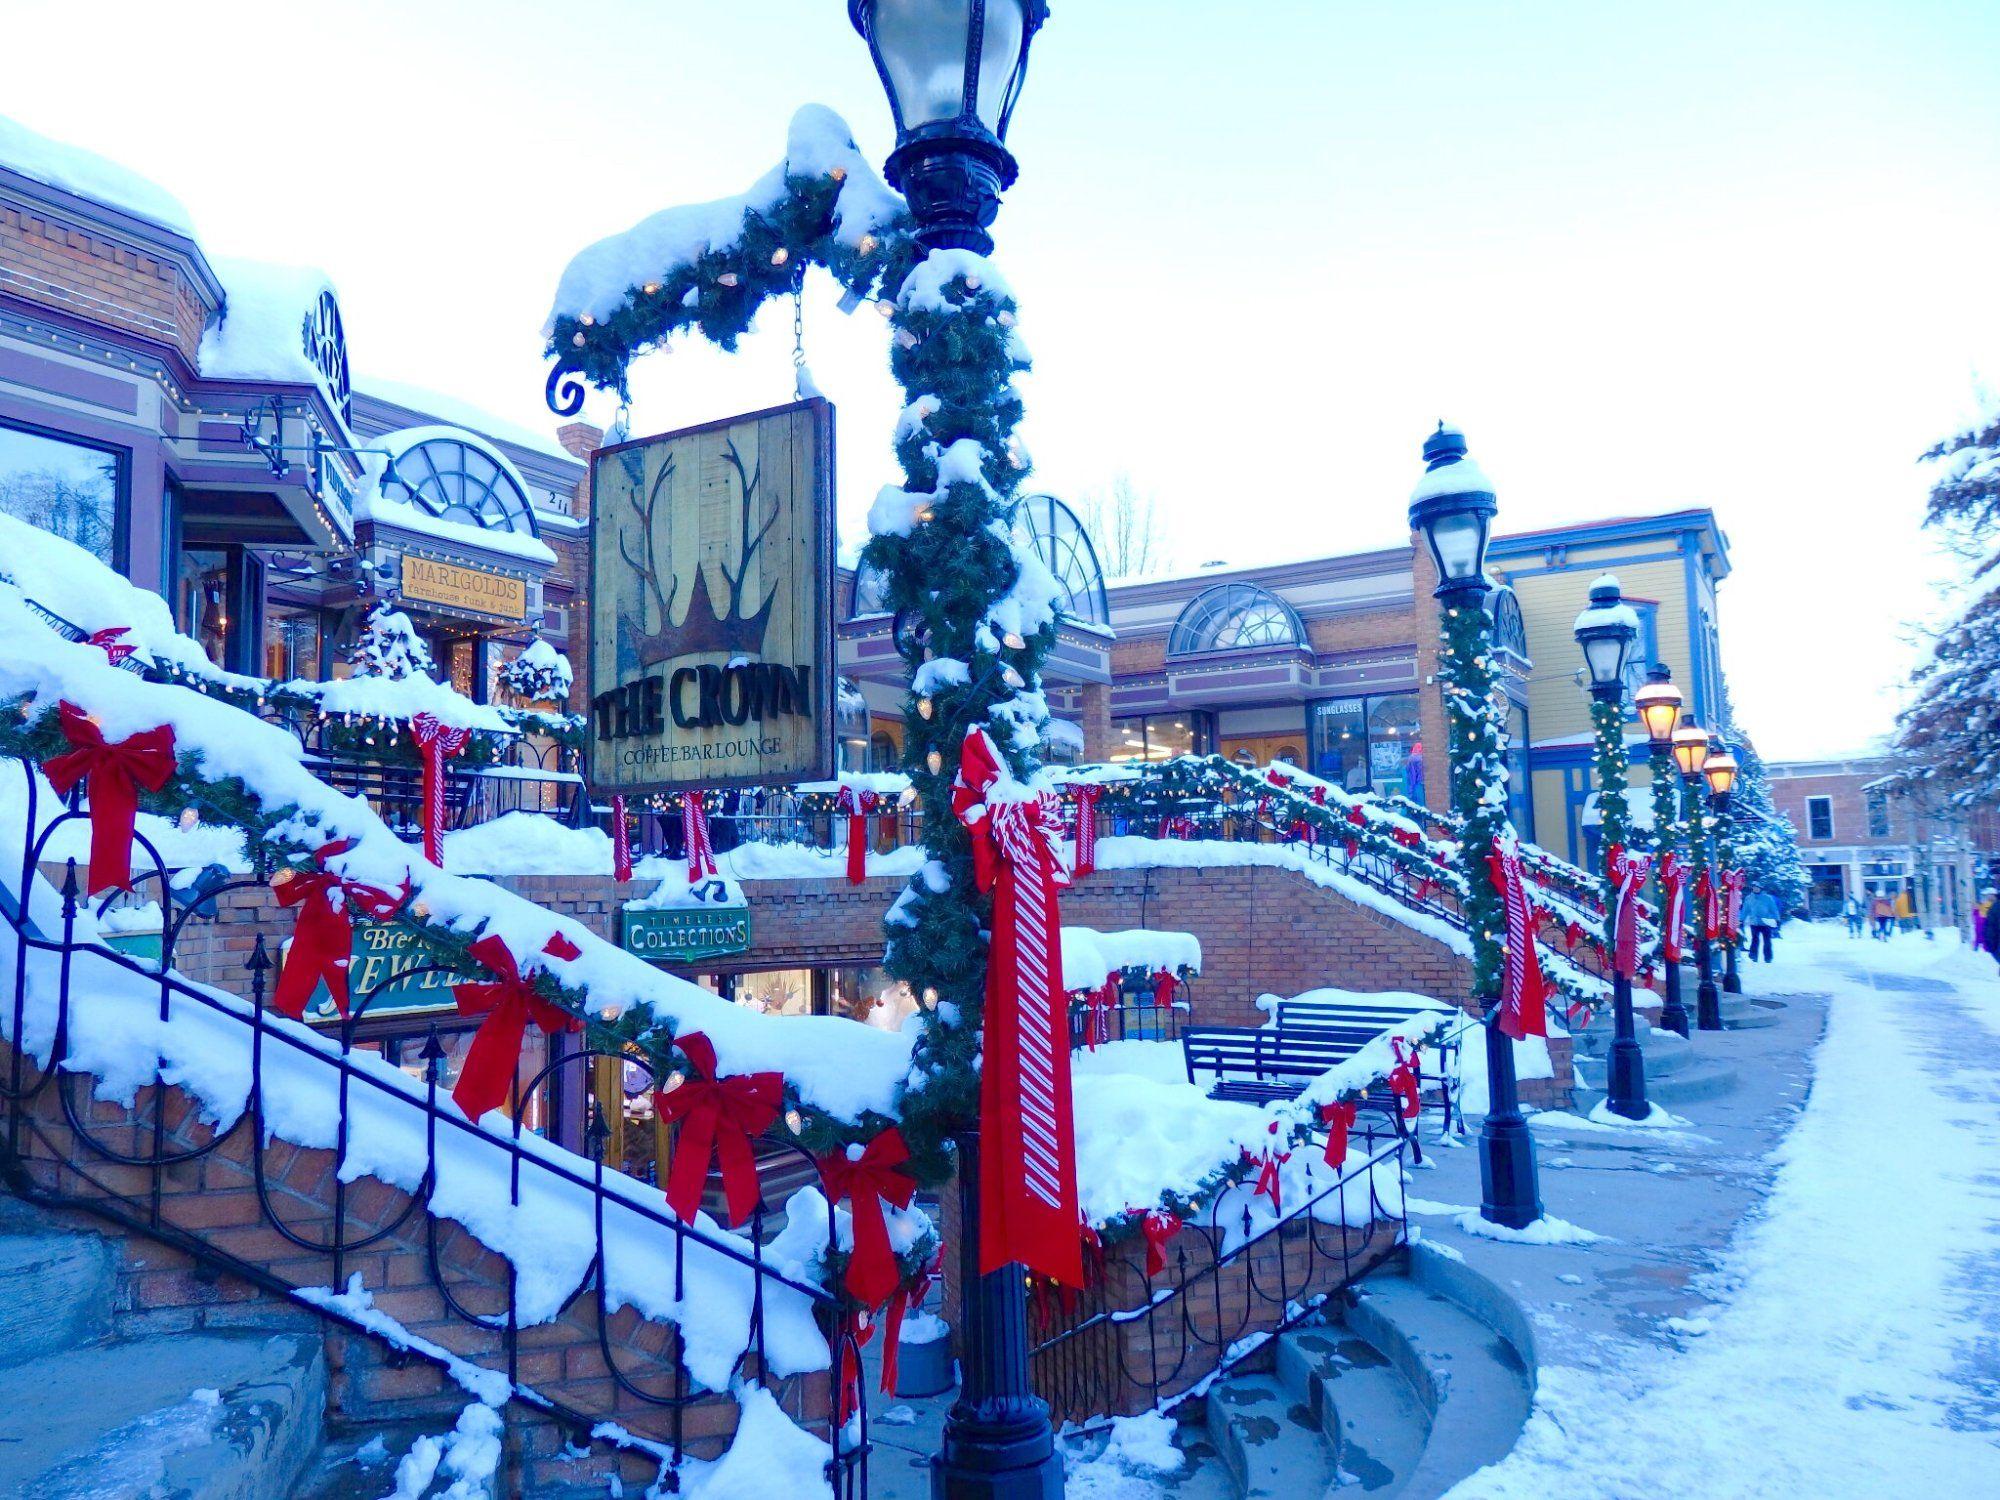 Main Street Breckenridge Co Top Tips Before You Go Tripadvisor Colorado Travel Breckenridge Colorado Winter Breckenridge Colorado